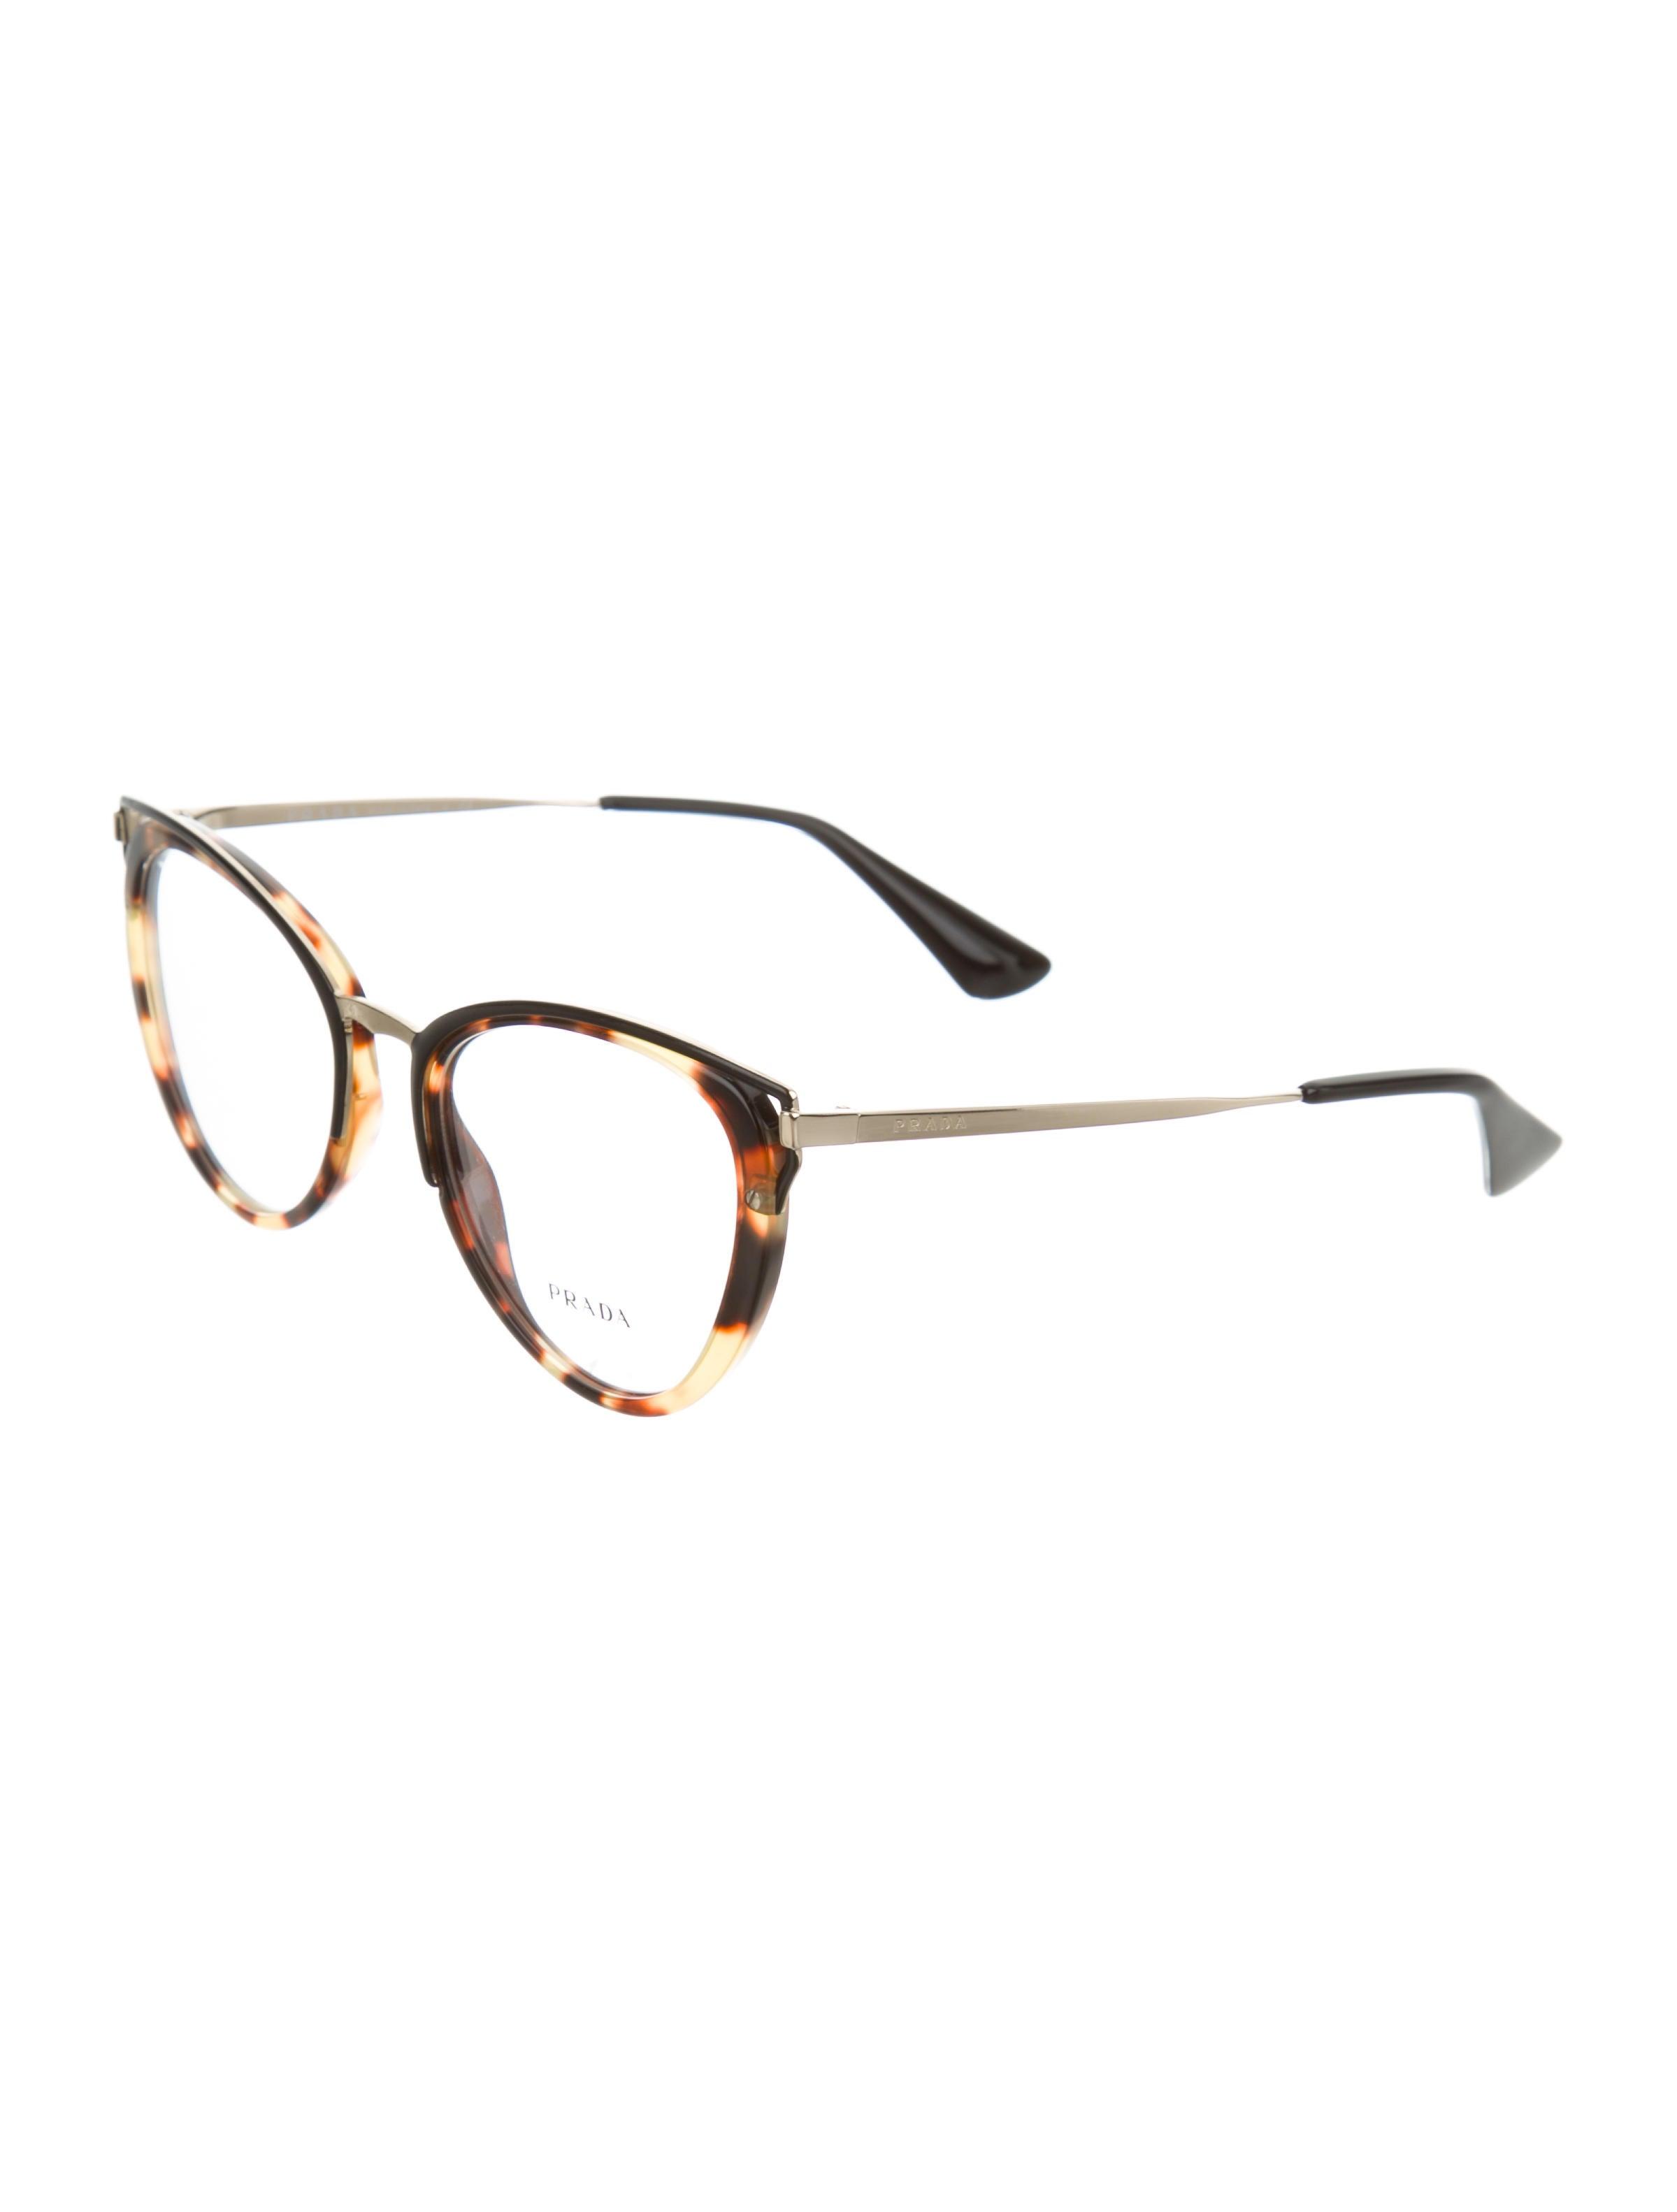 prada tortoiseshell cat eye eyeglasses w tags